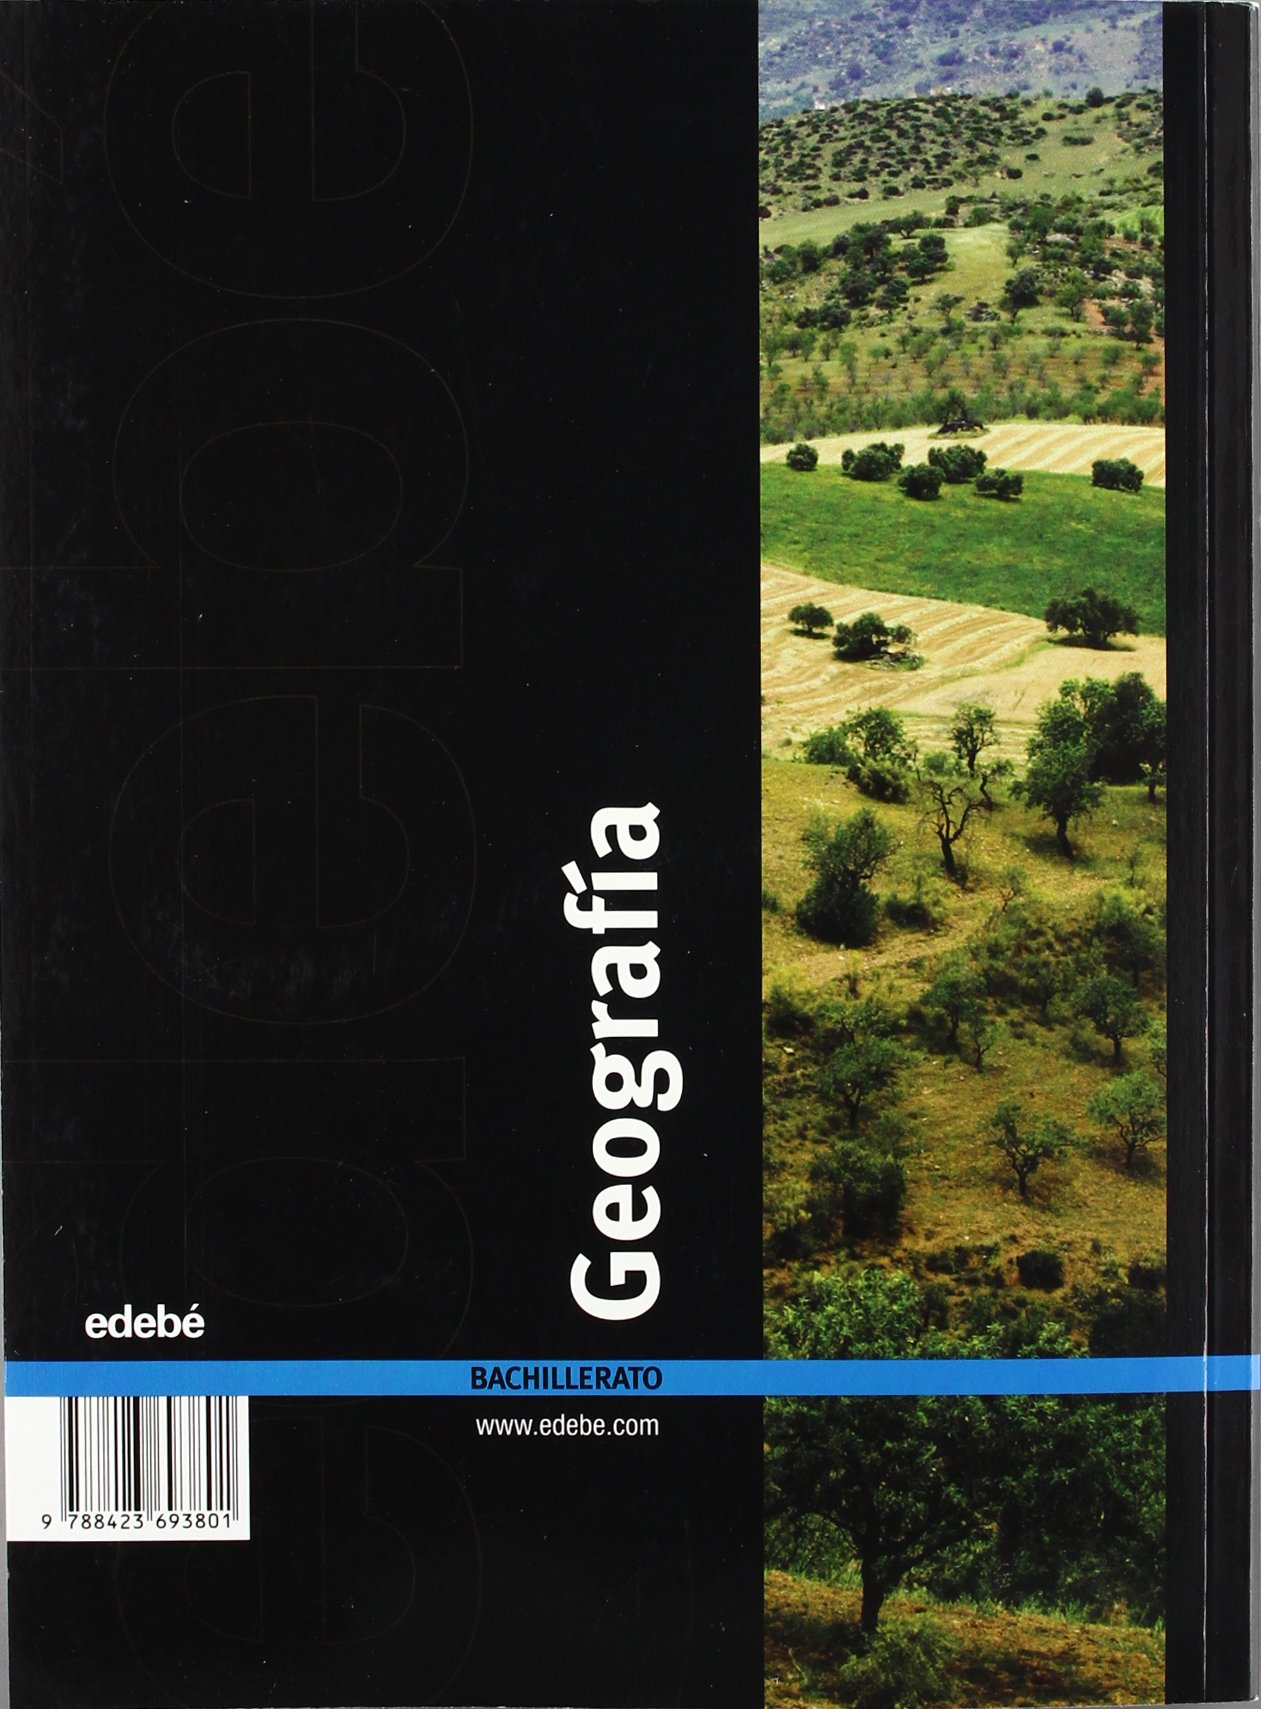 Geografía, Bachillerato - 9788423693801: Amazon.es: Edebé, Obra Colectiva: Libros